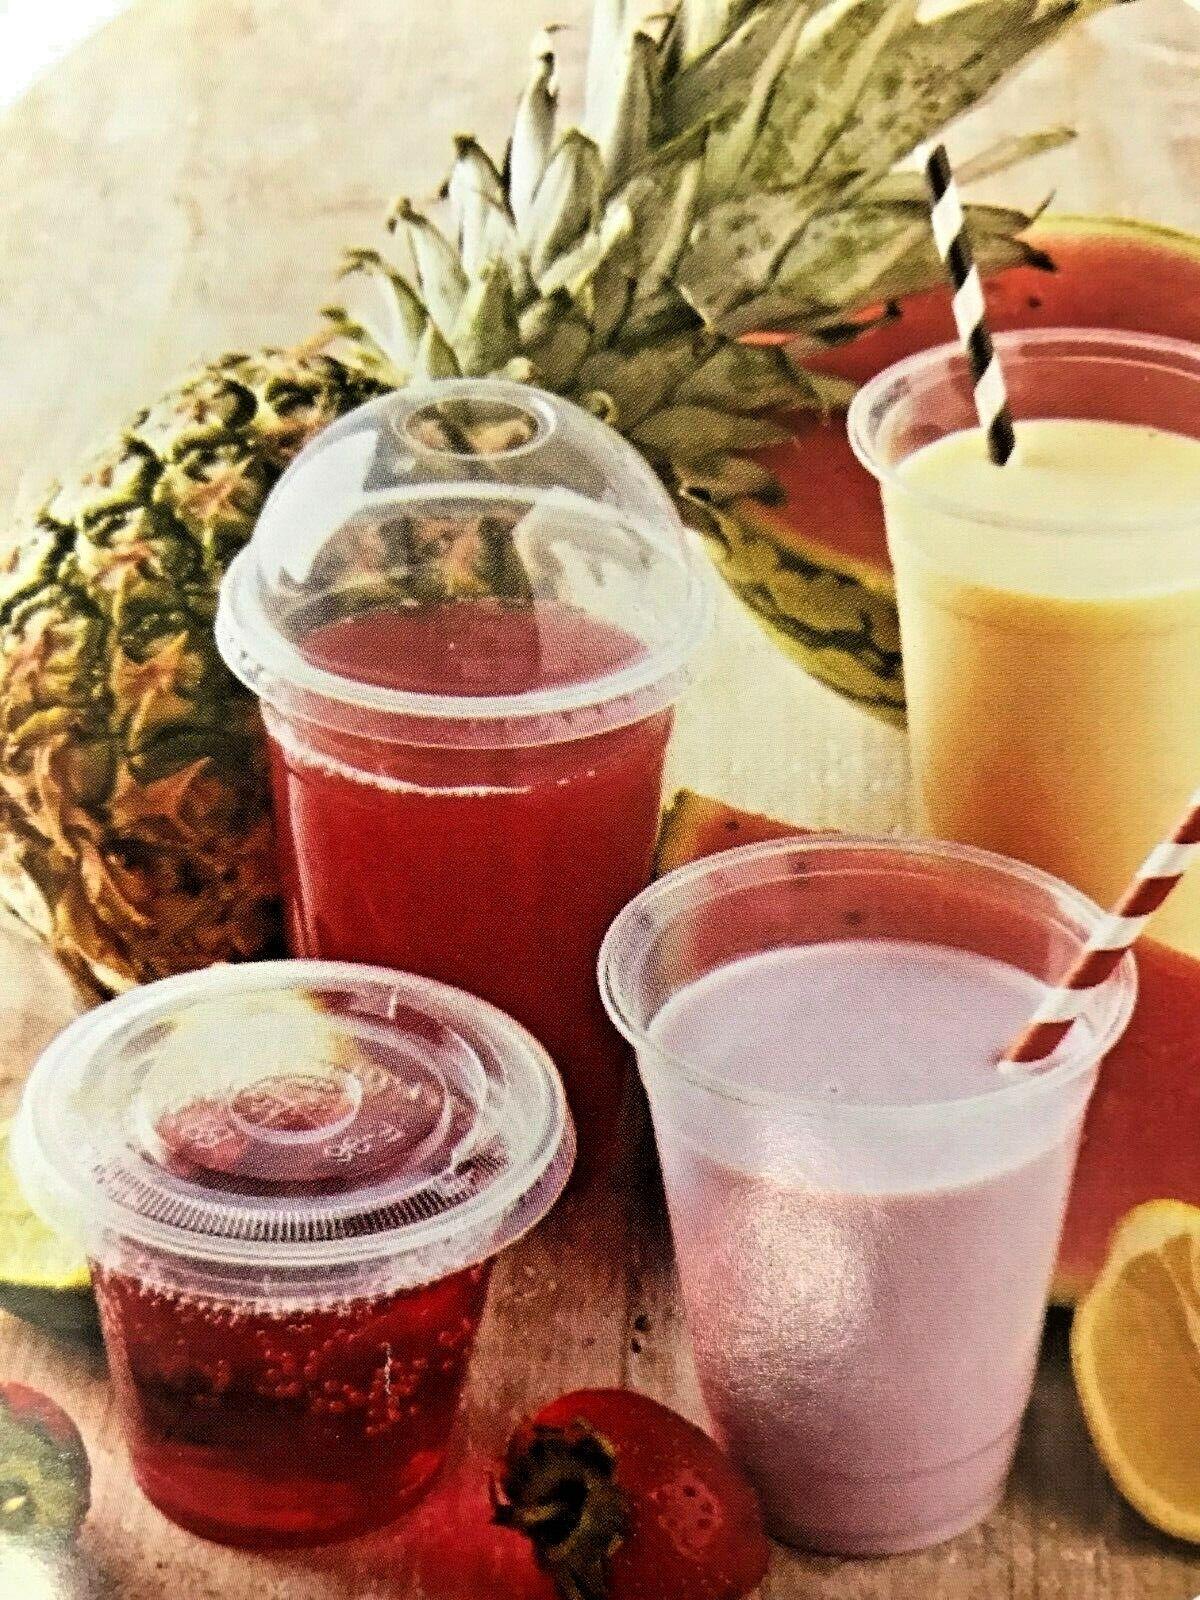 16oz Compostable Biodegradable Smoothie-Milkshake-sweets Cups & LidsBIO750B D E